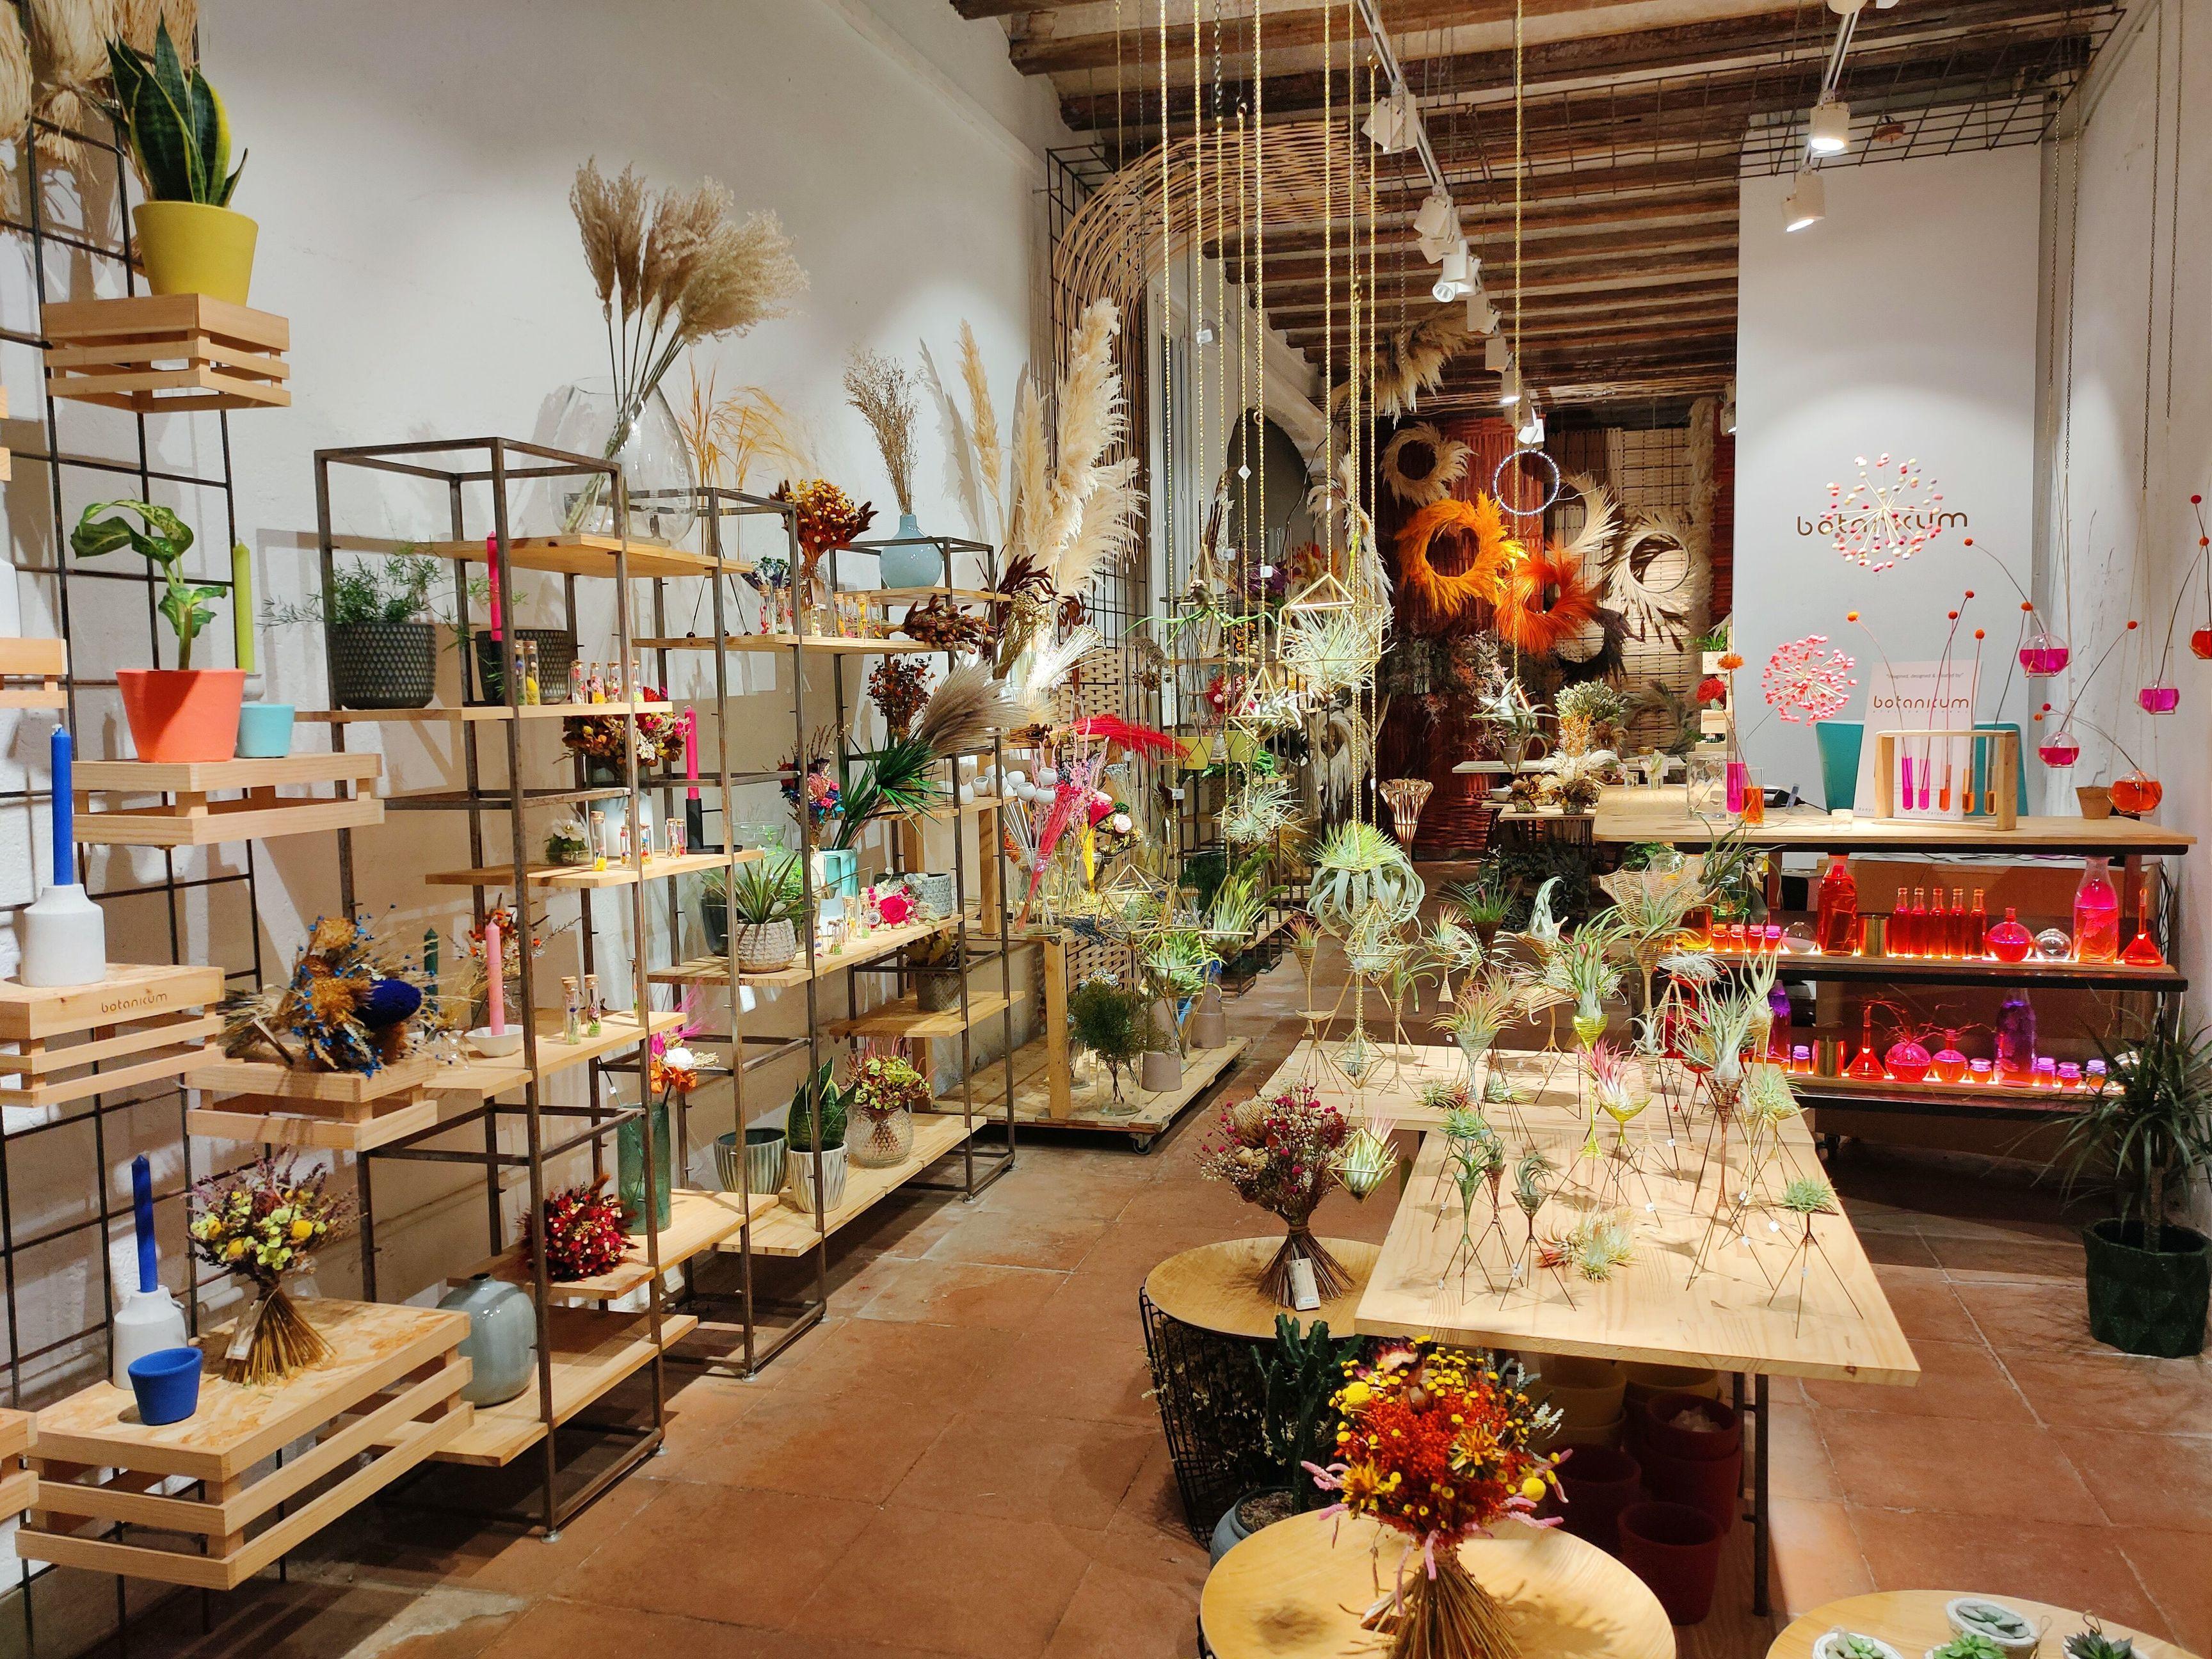 Botanicum atelier floral in Barcelona